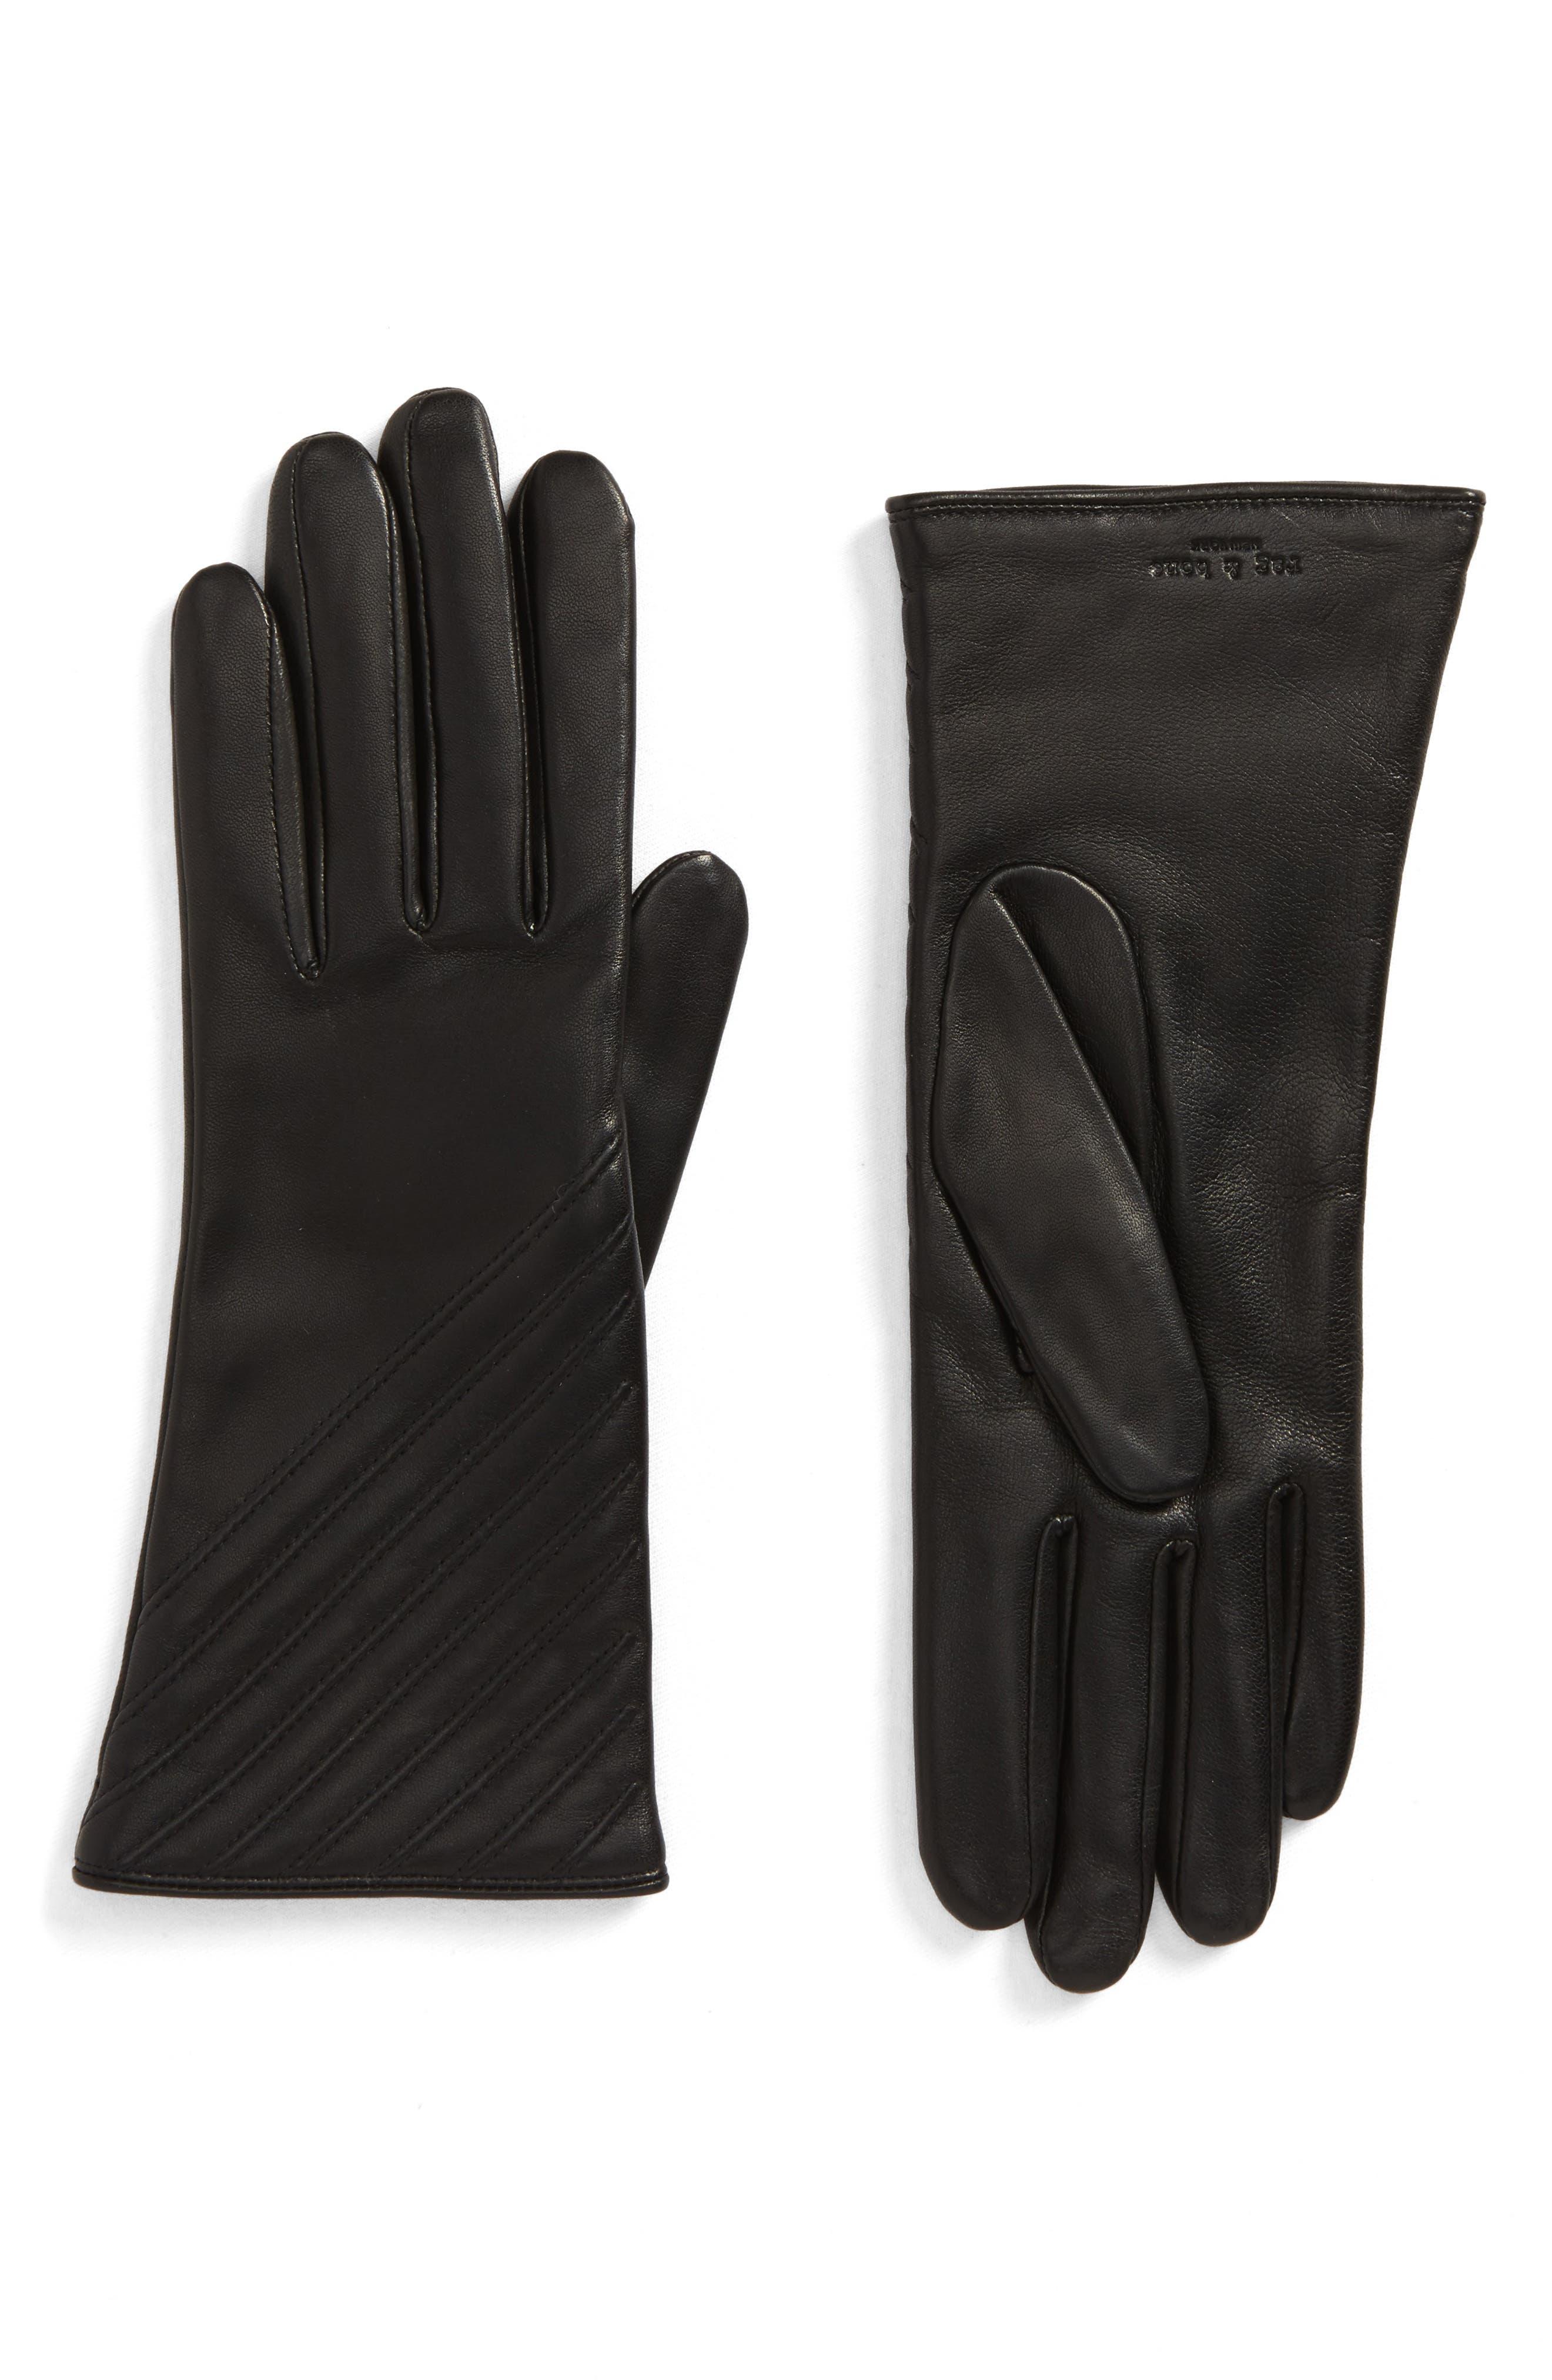 Slant Leather Gloves,                             Main thumbnail 1, color,                             Black